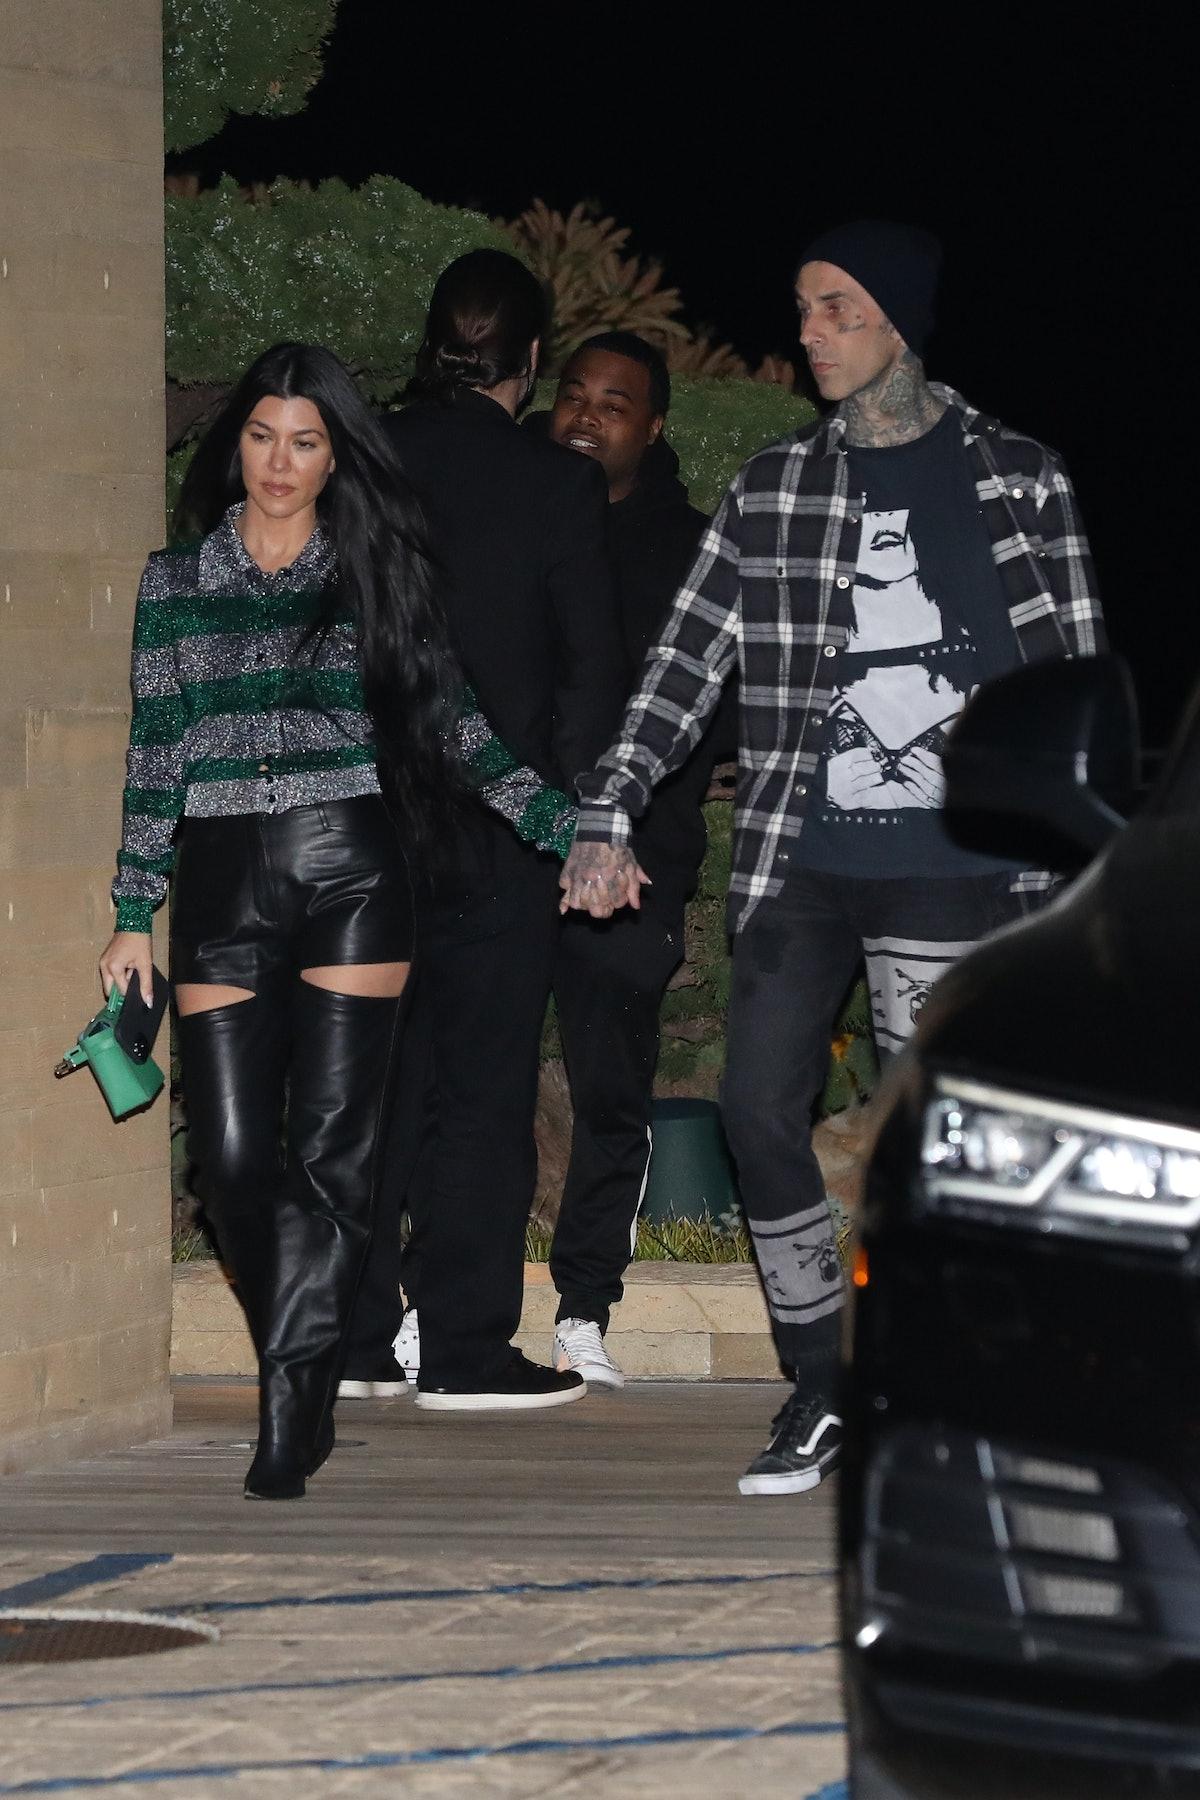 Kim Kardashian and Travis Barker did not have an affair, despite alleged claims.